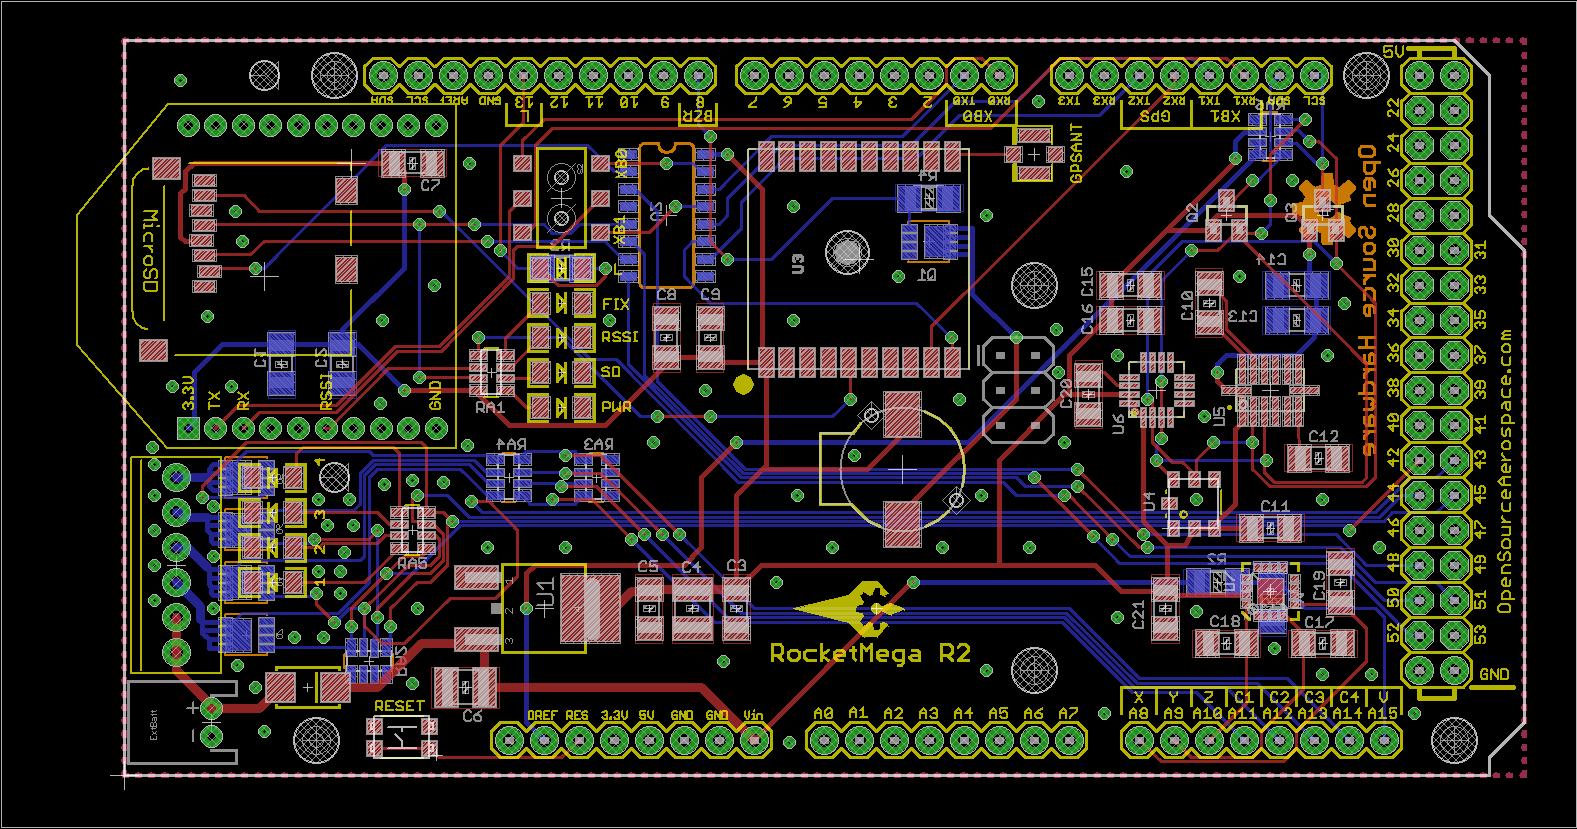 v2 circuit layout